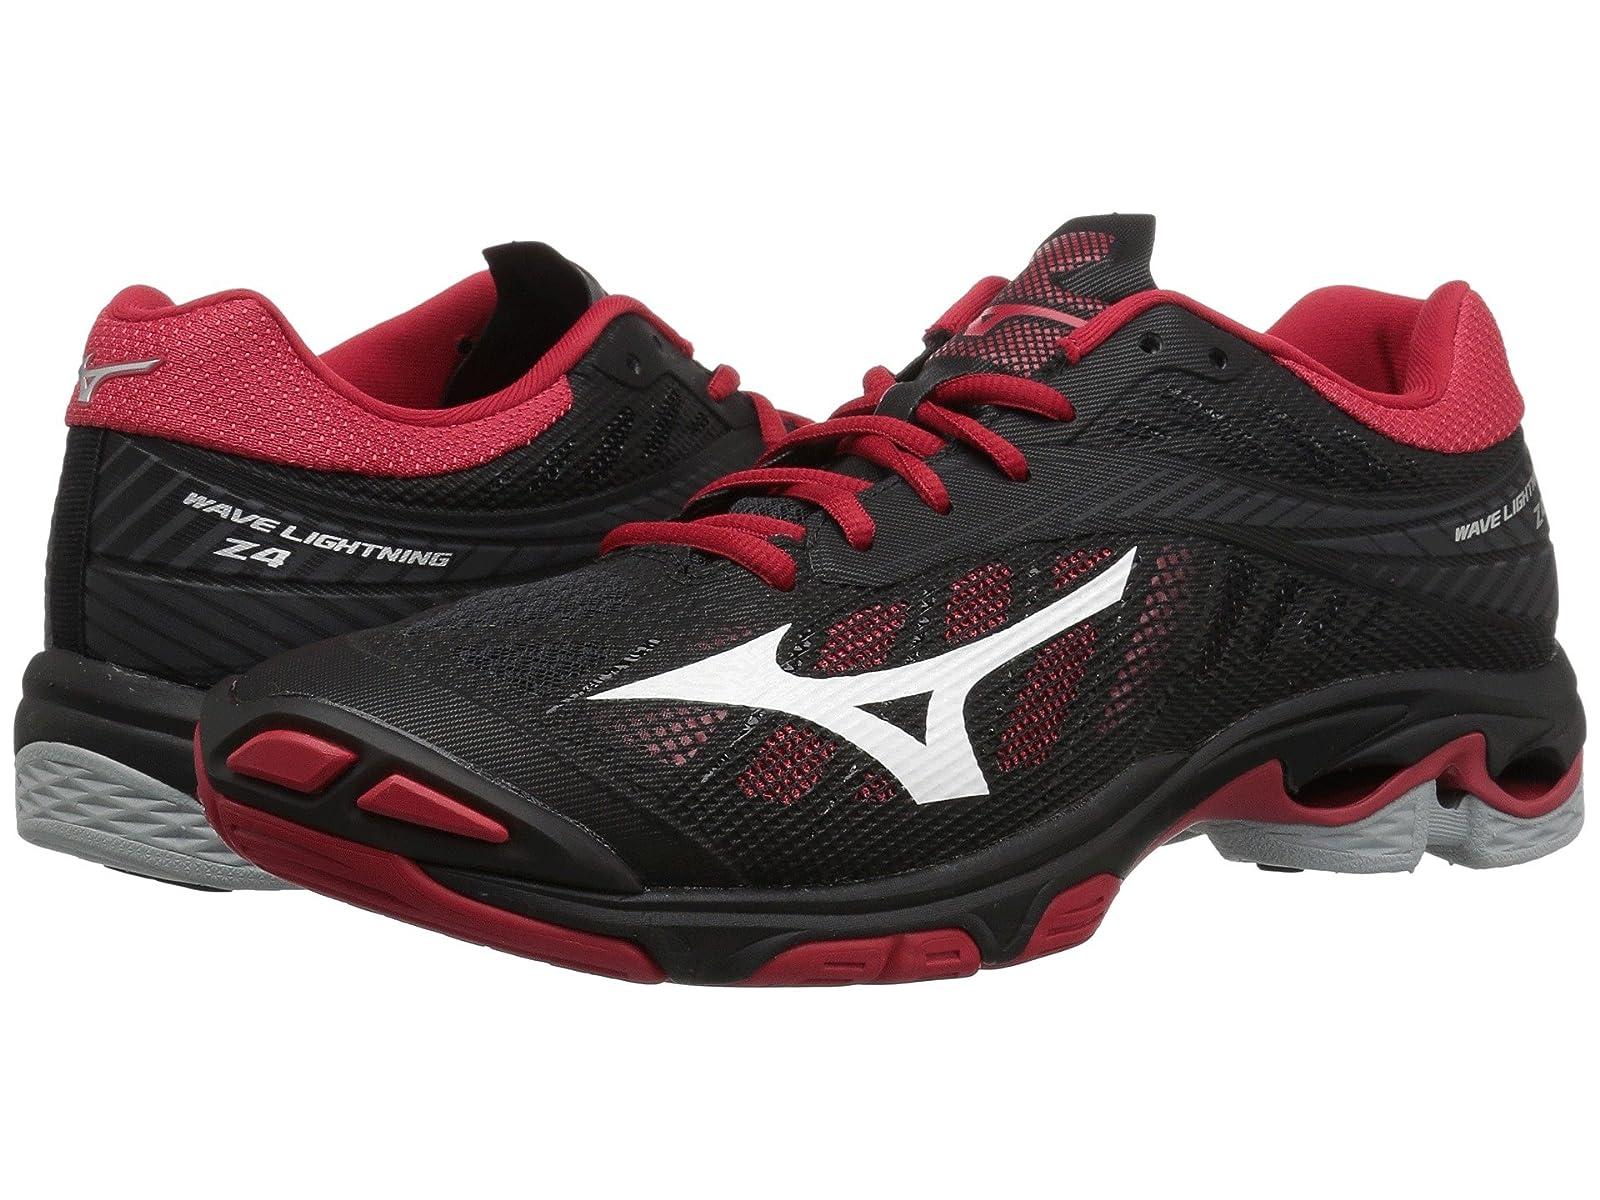 Mizuno Wave Lightning Z4Atmospheric grades have affordable shoes